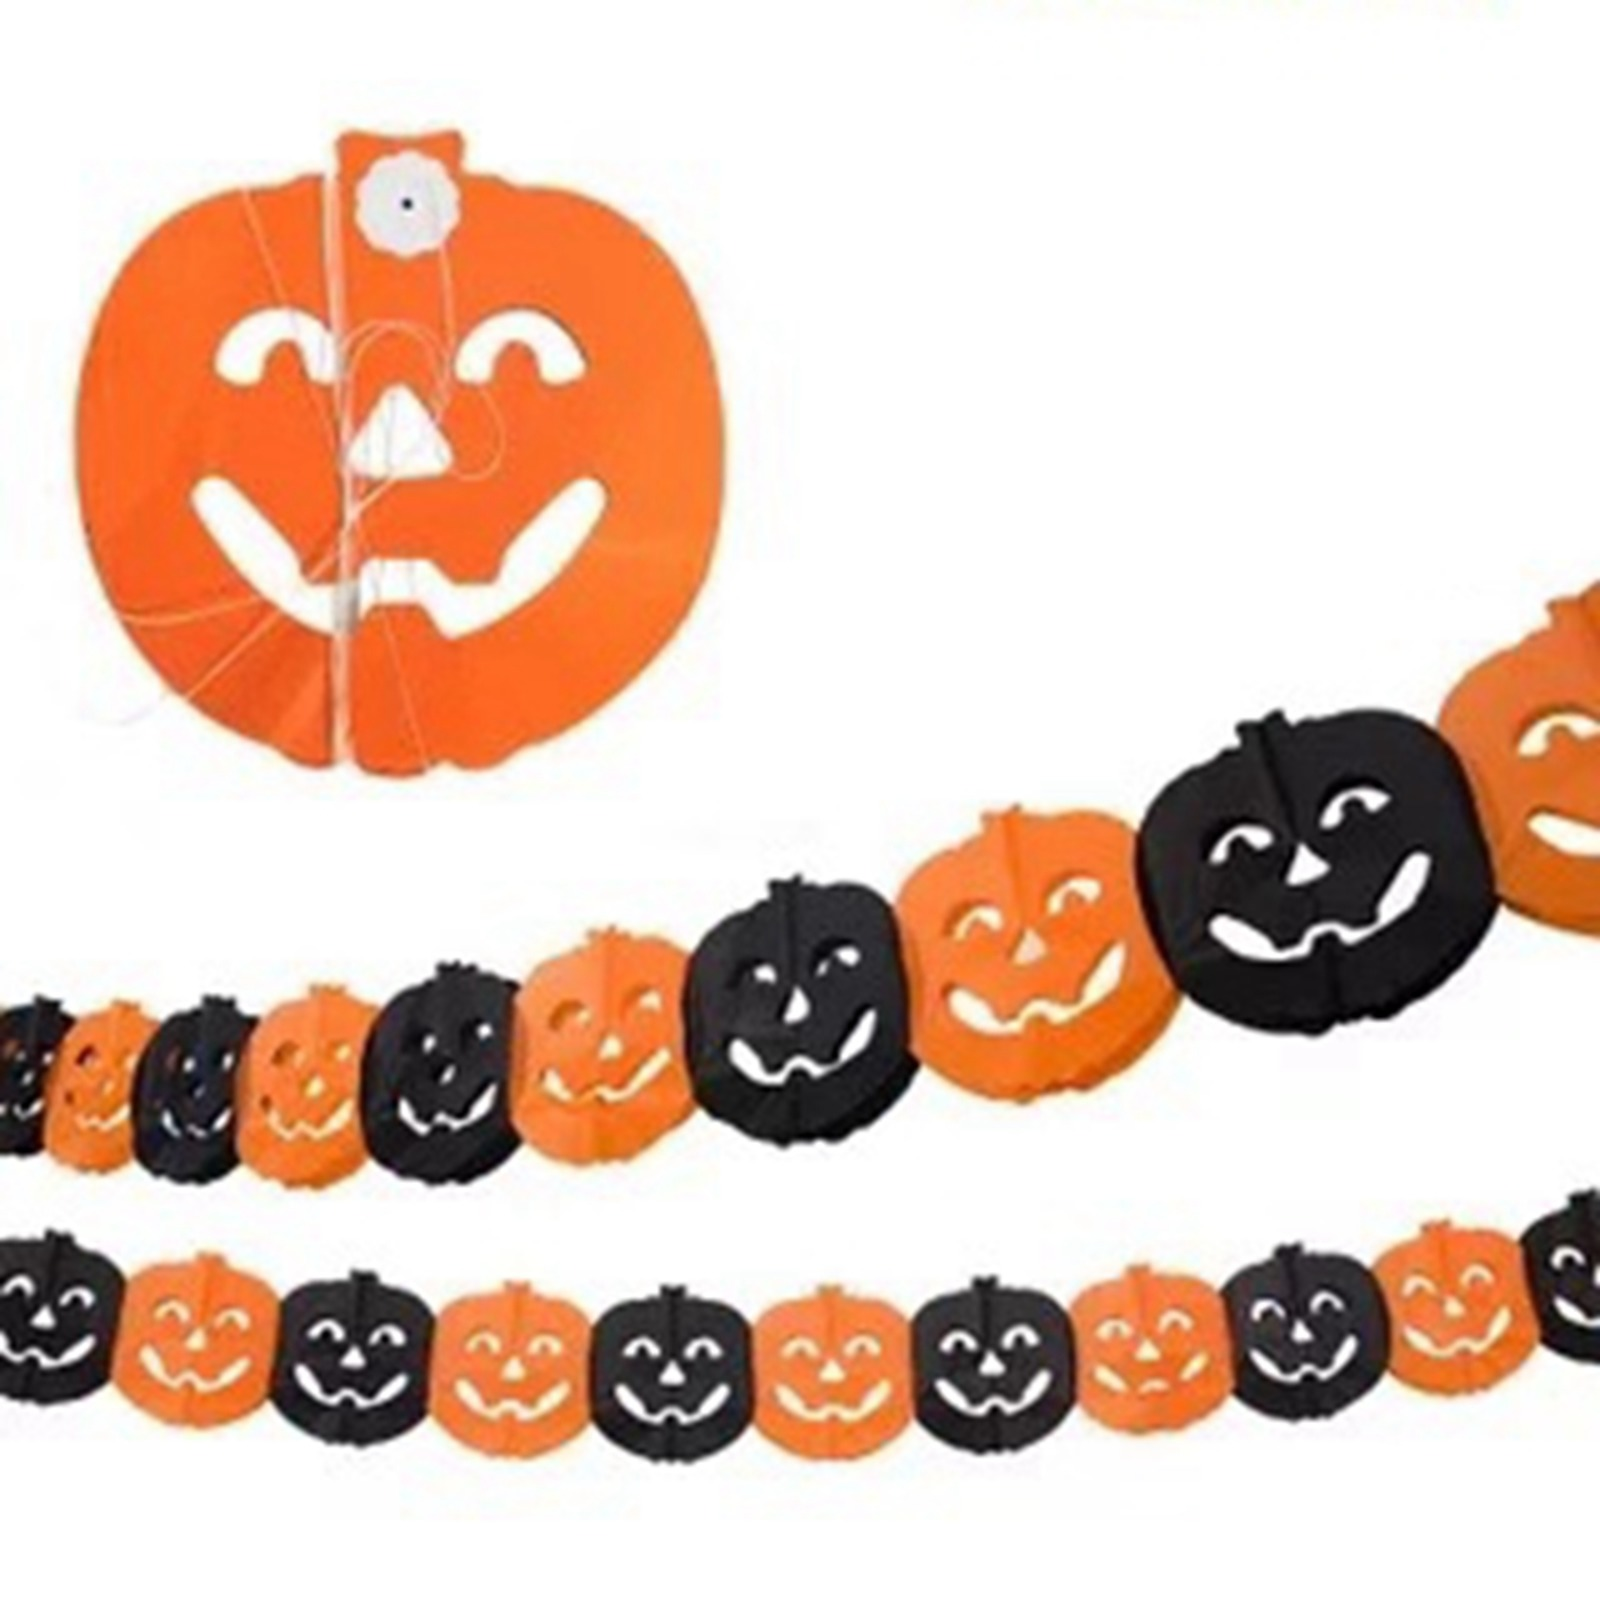 Pumpkin Paper Garland Decoration